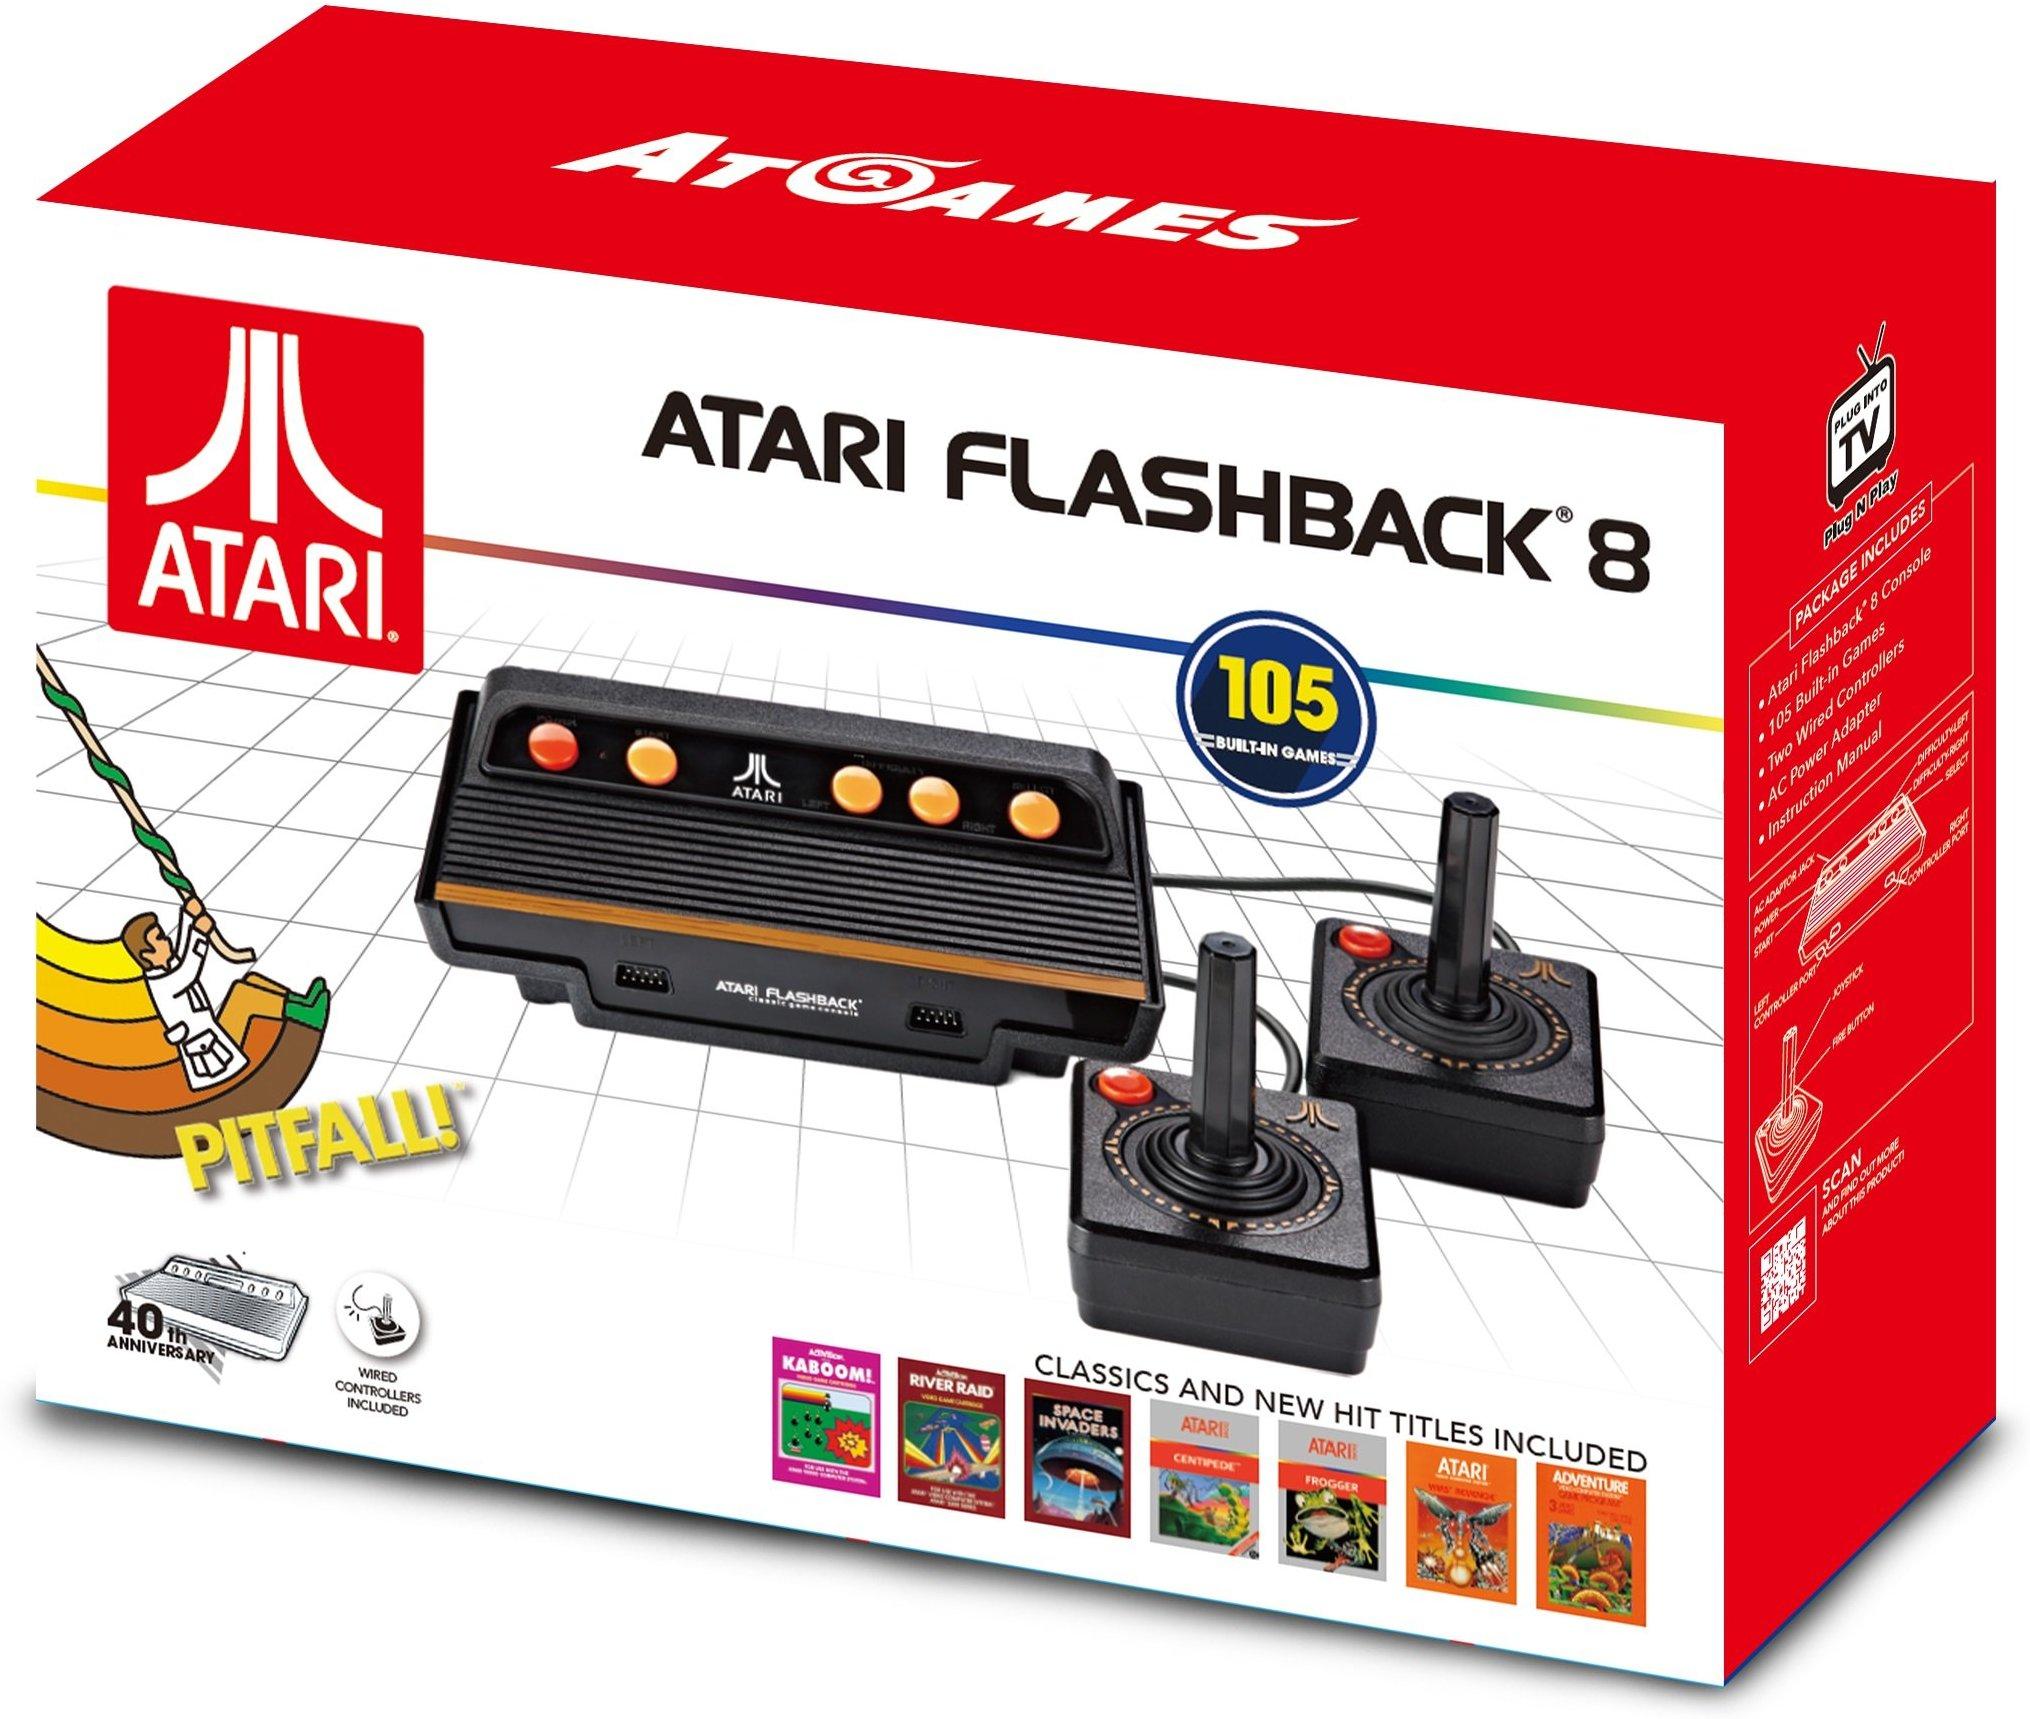 Retro Game Console Atari